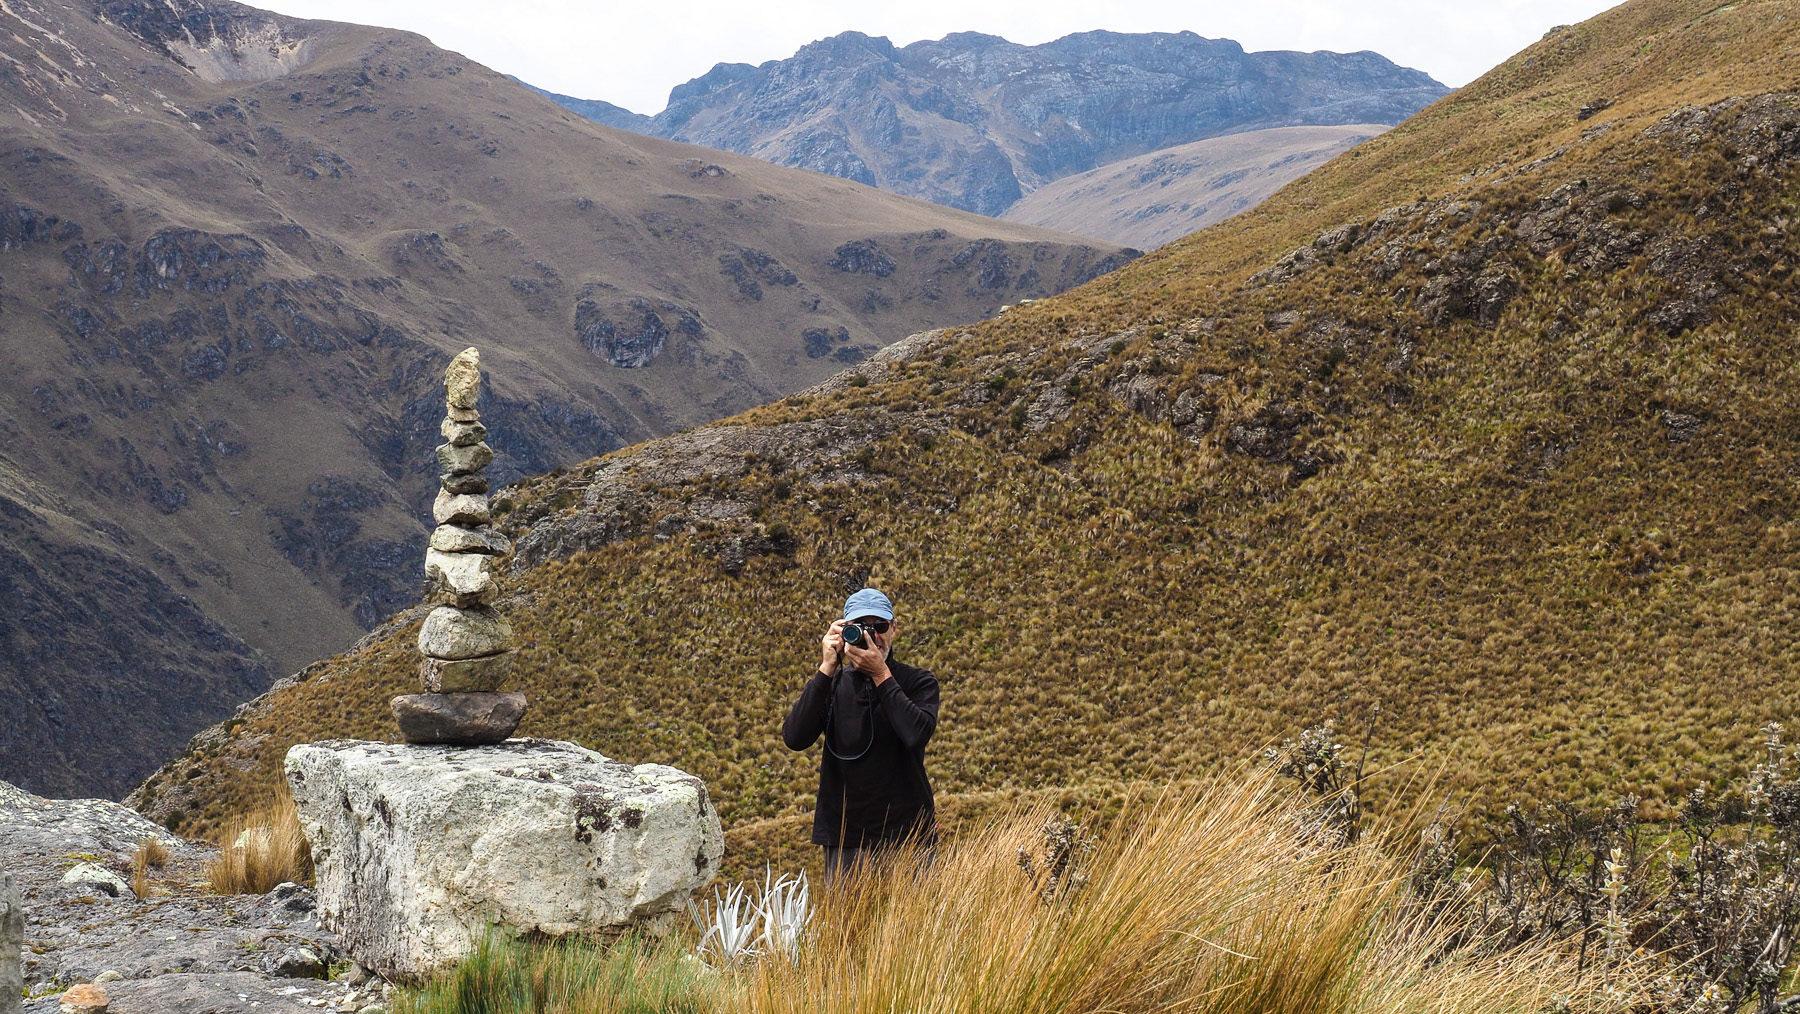 Georg's Stoamanderl am höchten Punkt unserer Wanderung